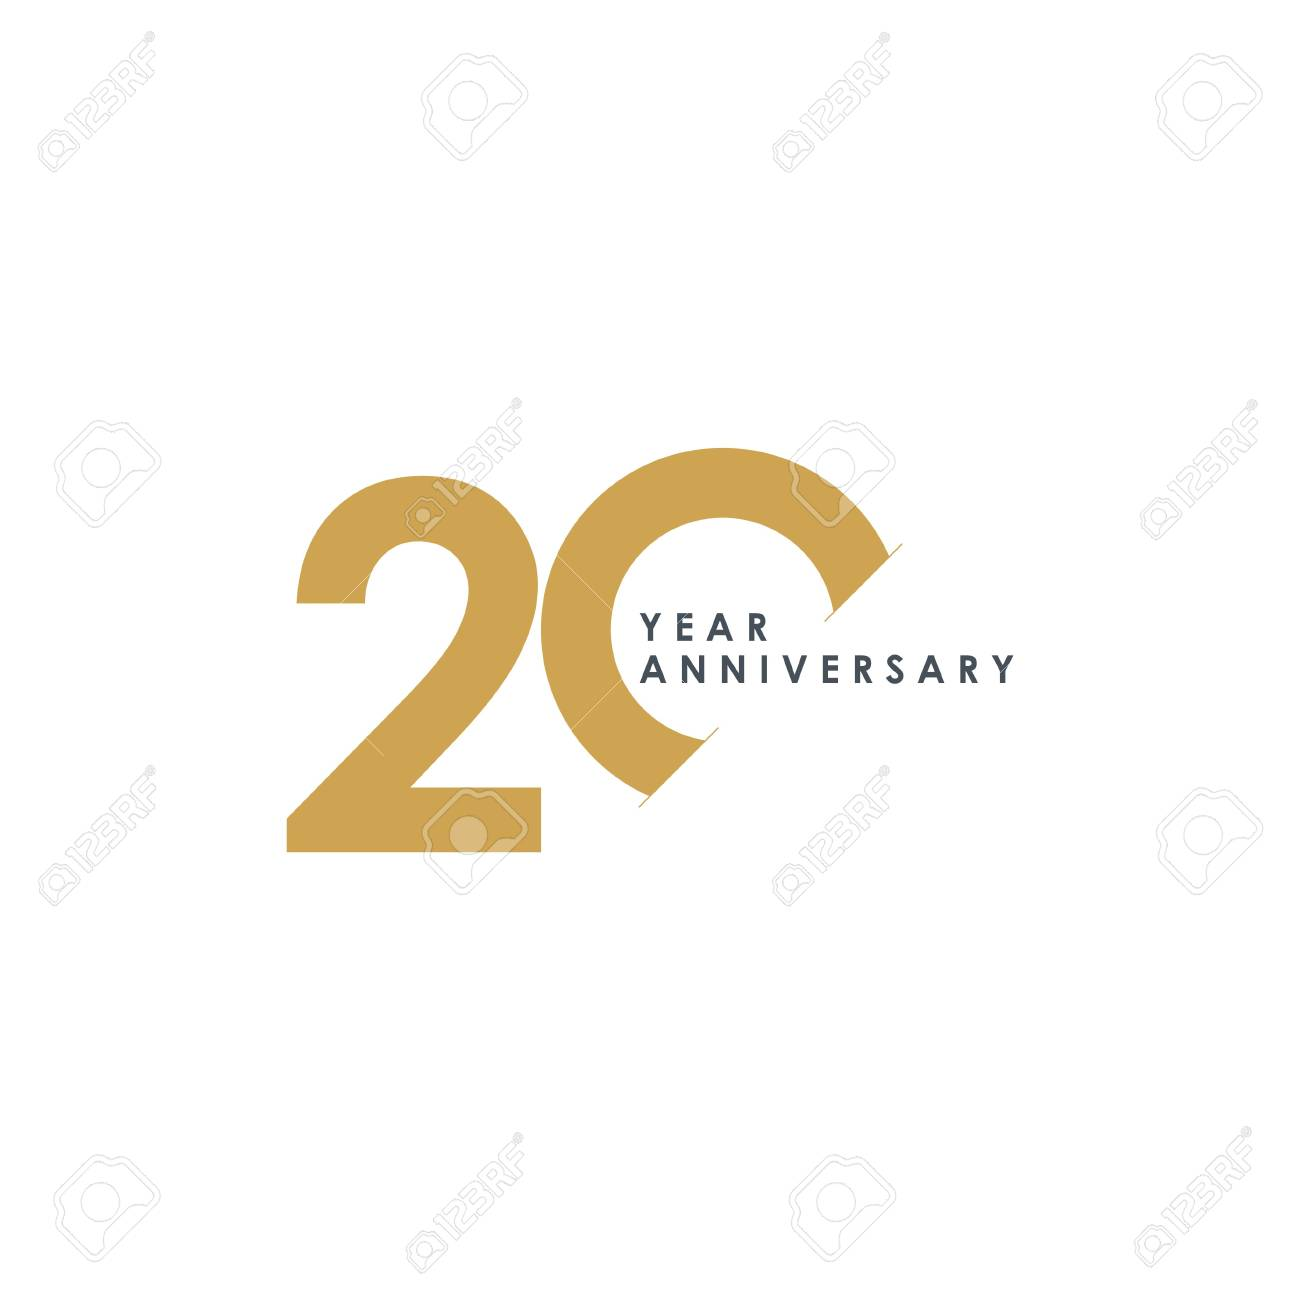 20 Year Anniversary Vector Template Design Illustration - 119347734